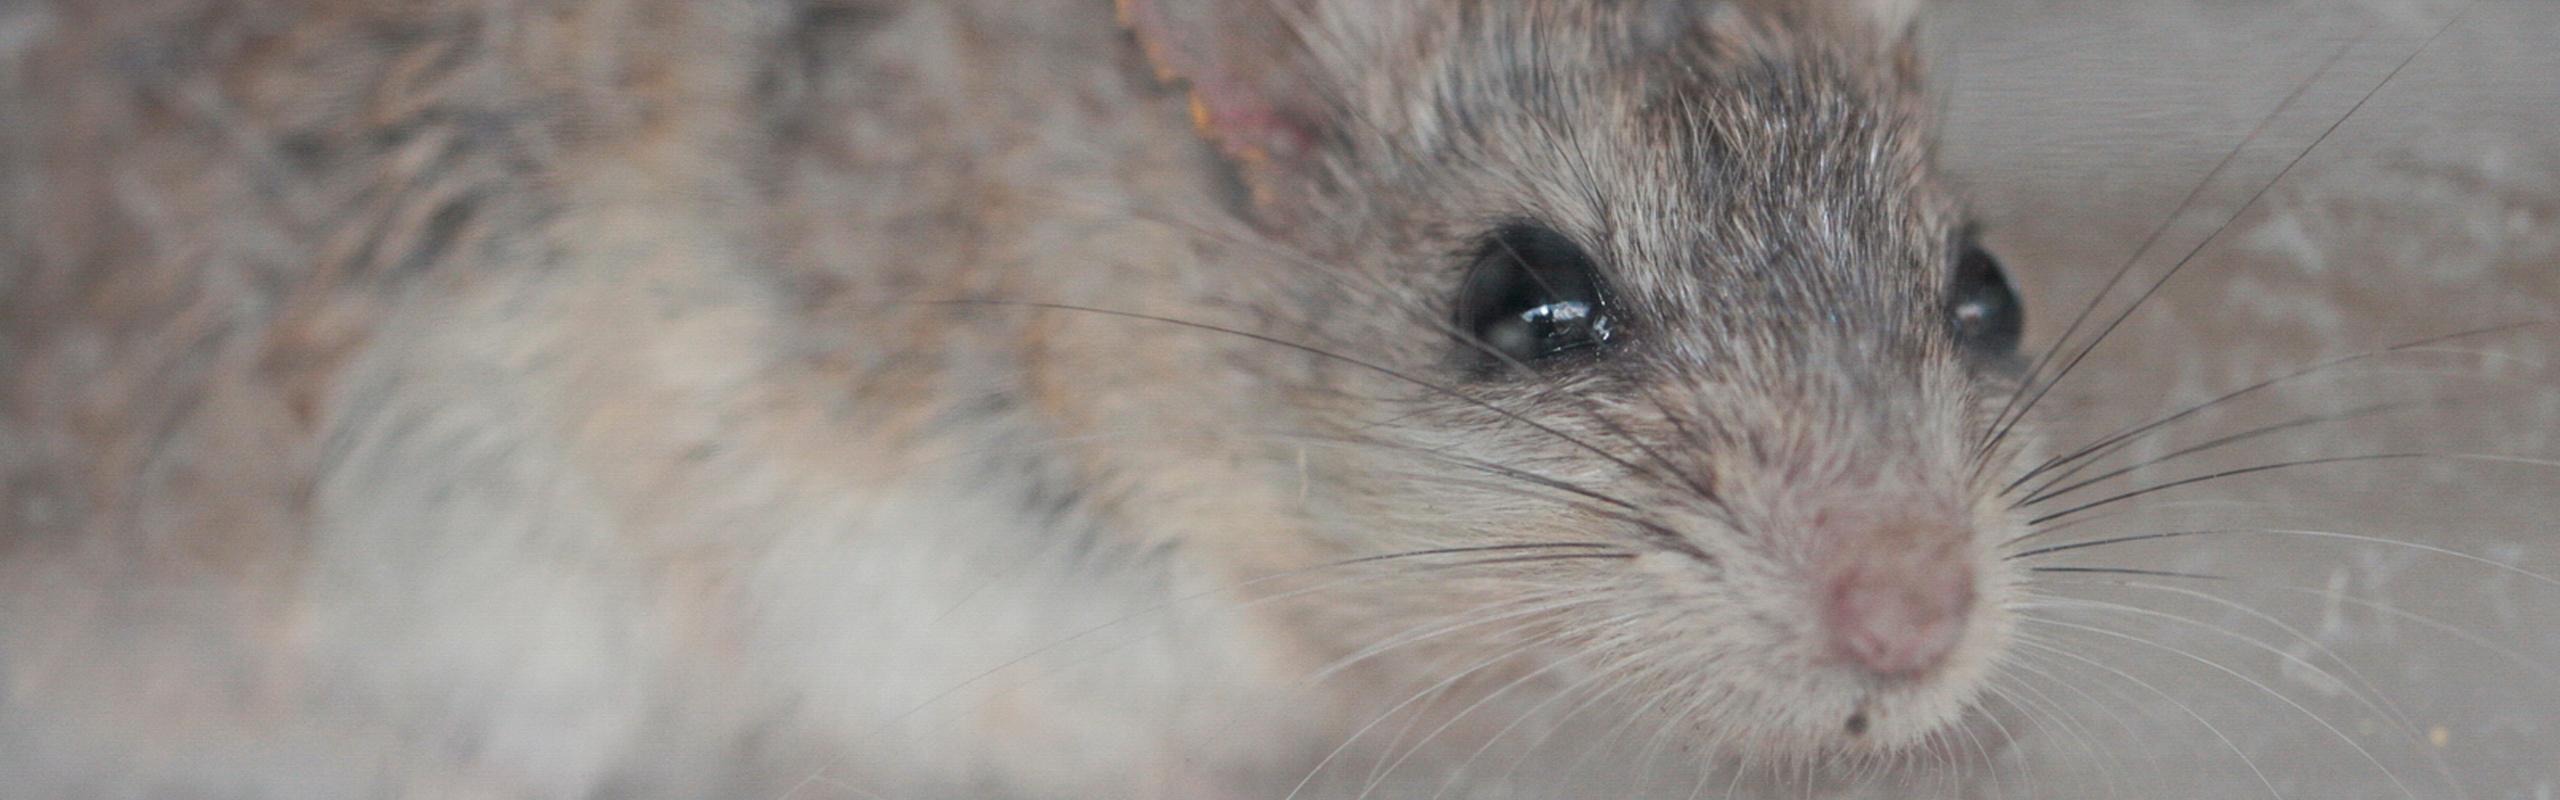 Southern Grasshopper Mouse